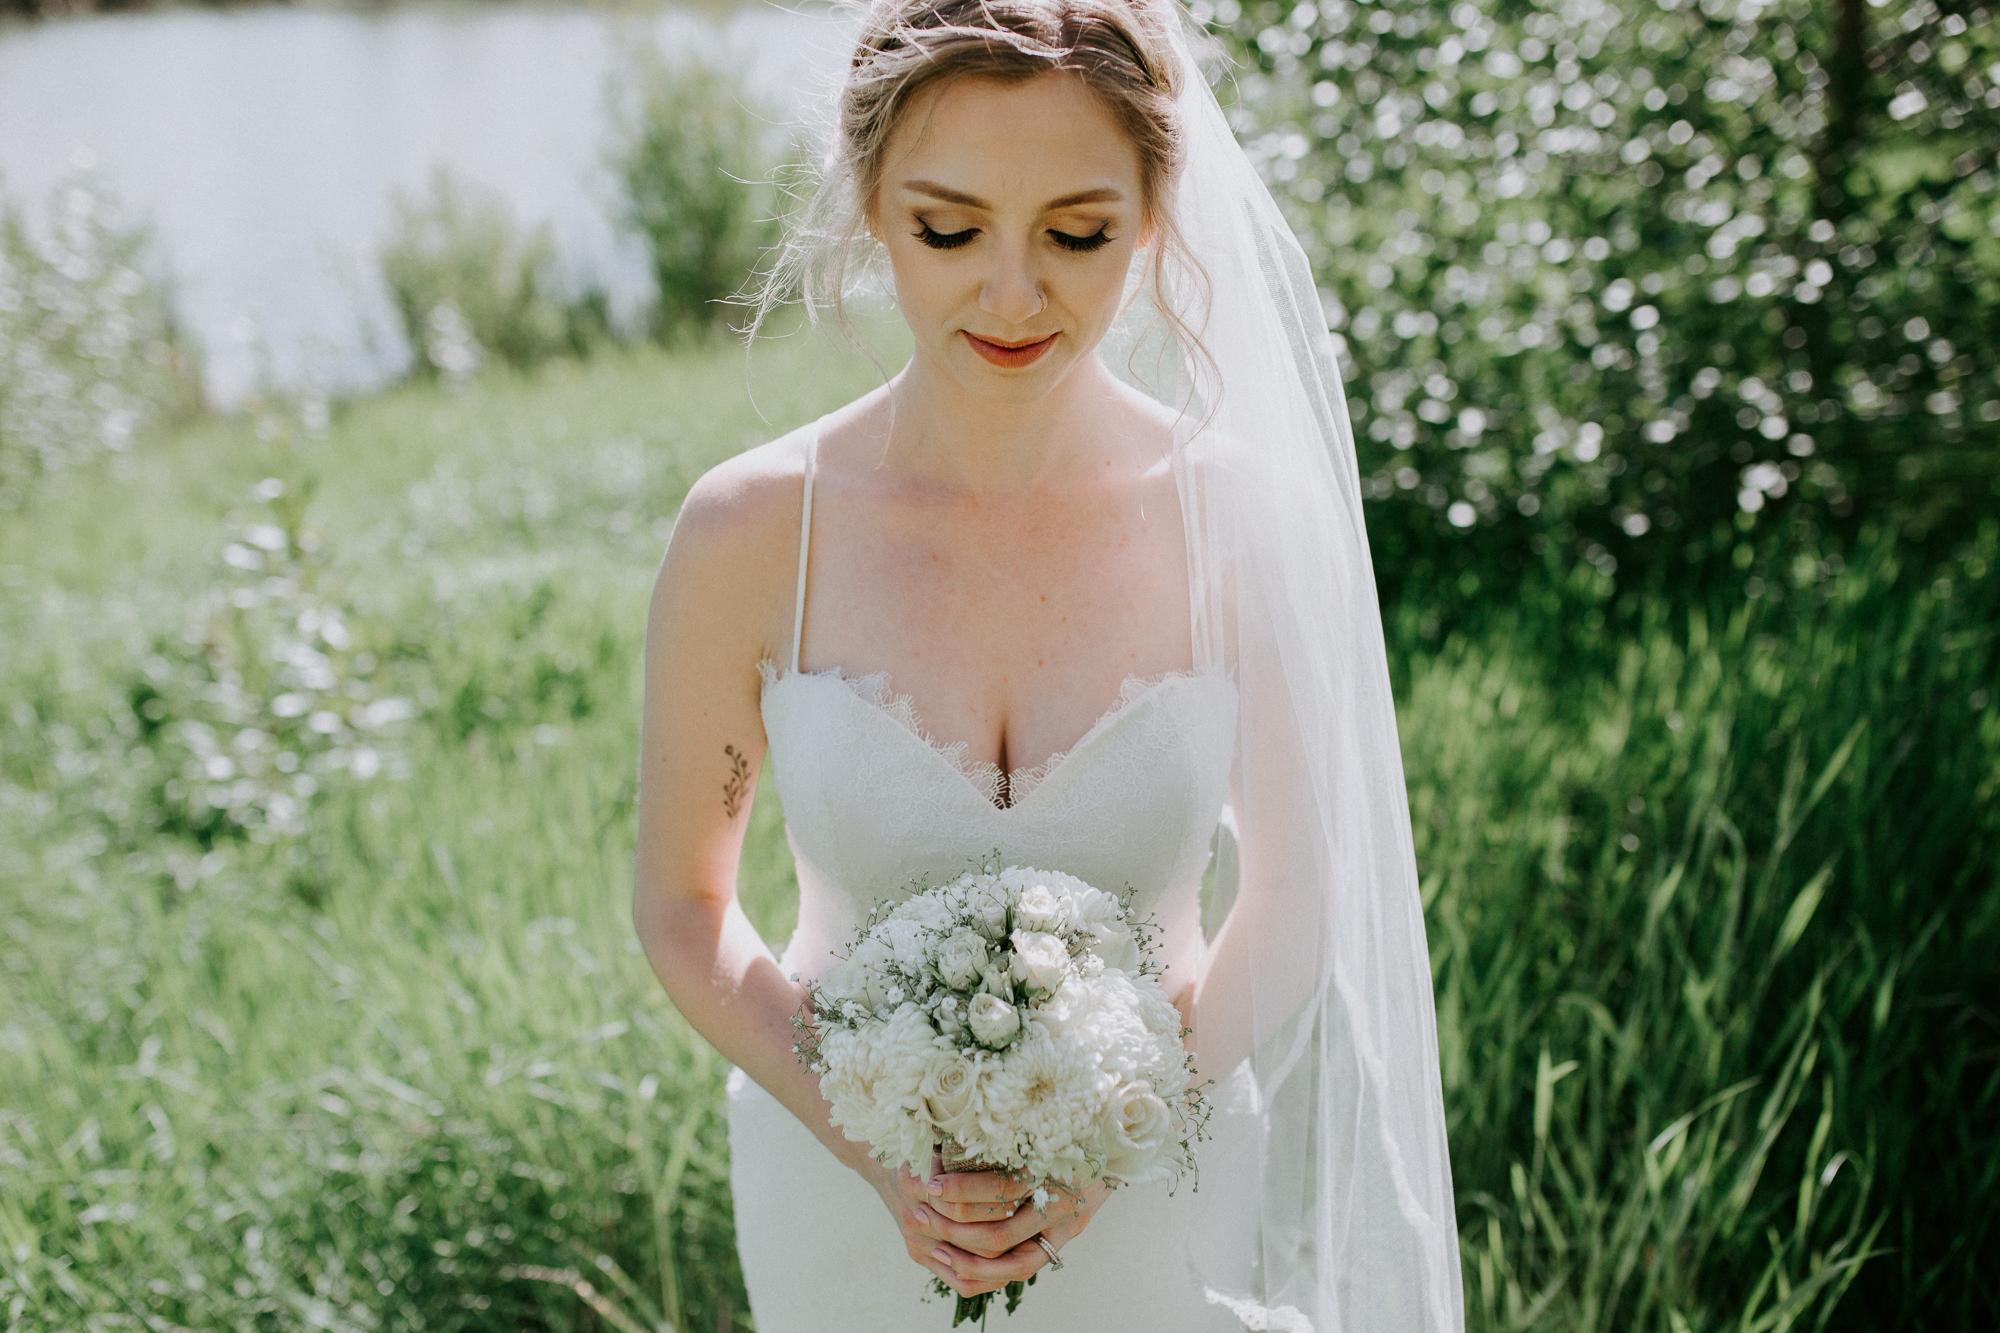 Calgary-wedding-photographer-am-69.jpg